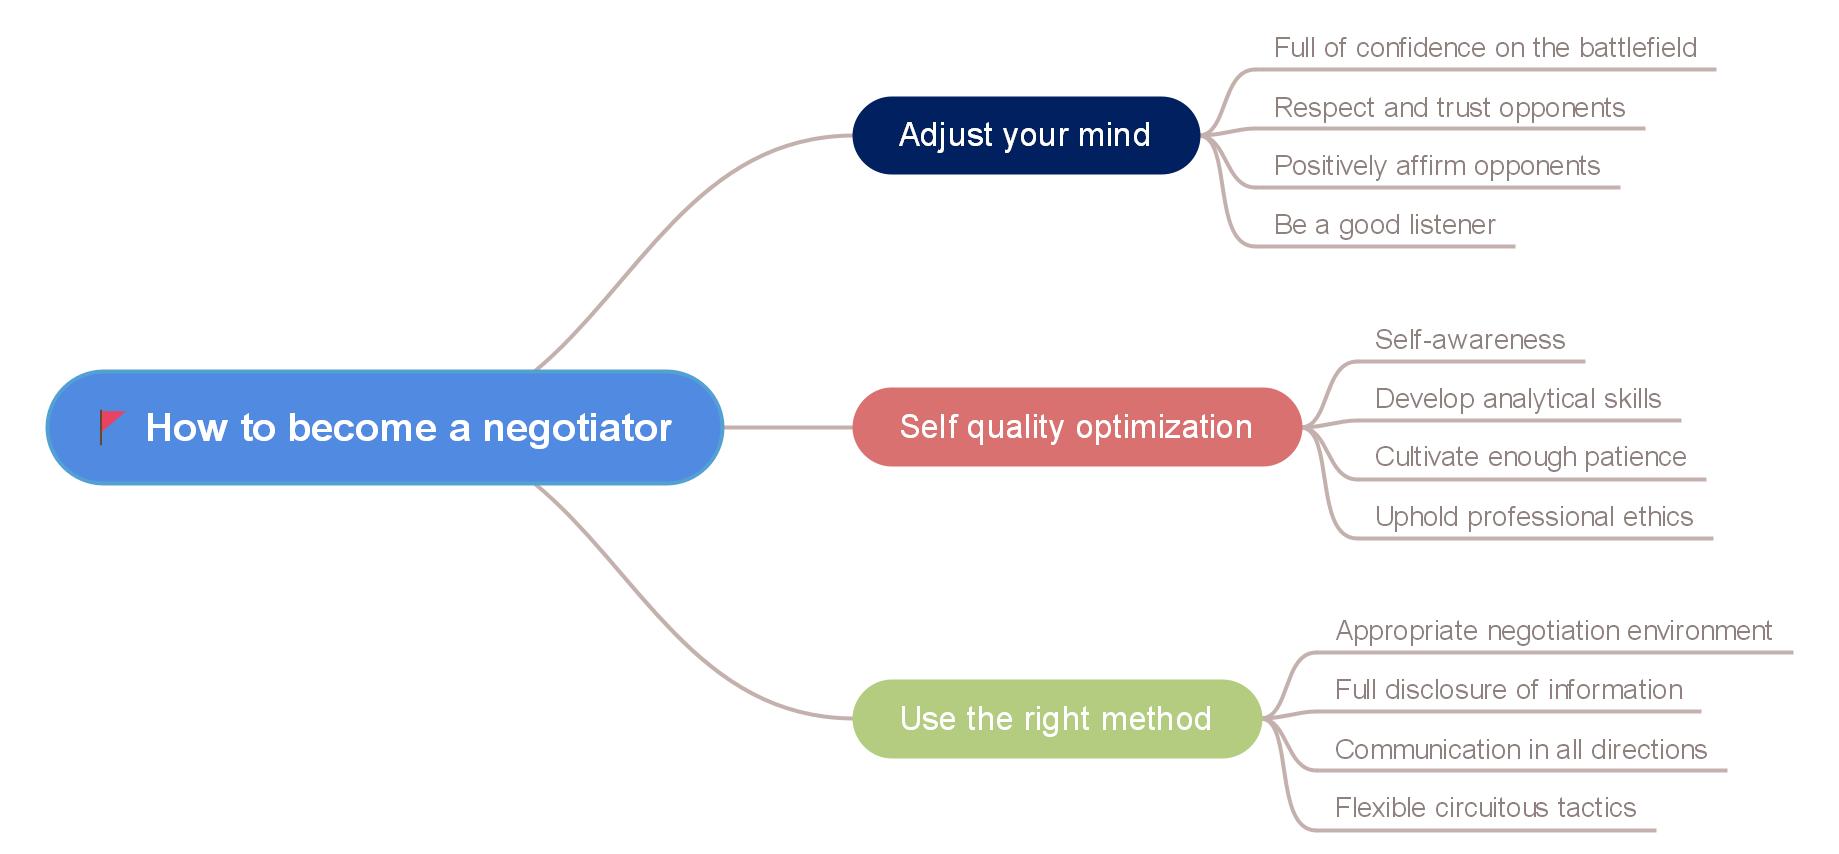 how to become a negotiator